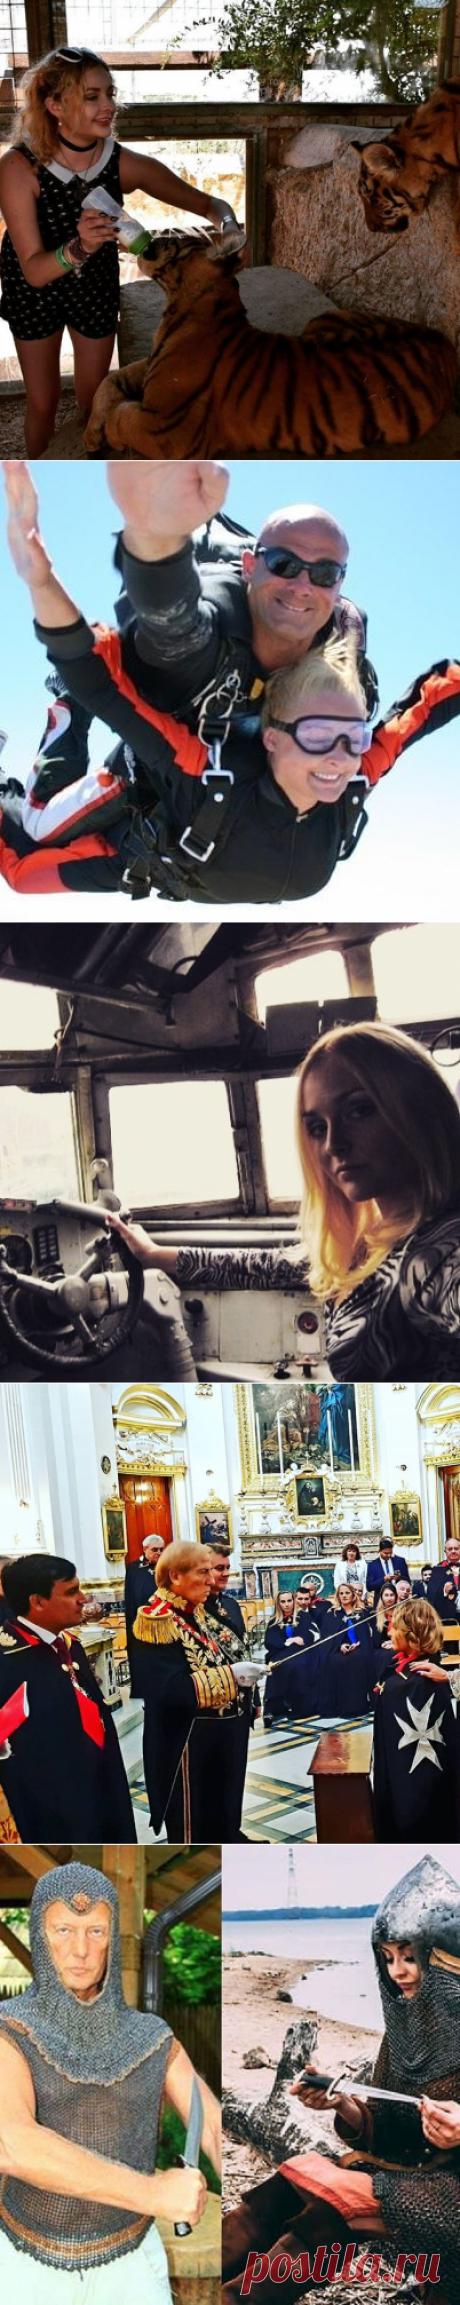 Jelena Zadornova (@jzadornova) • Фото и видео в Instagram